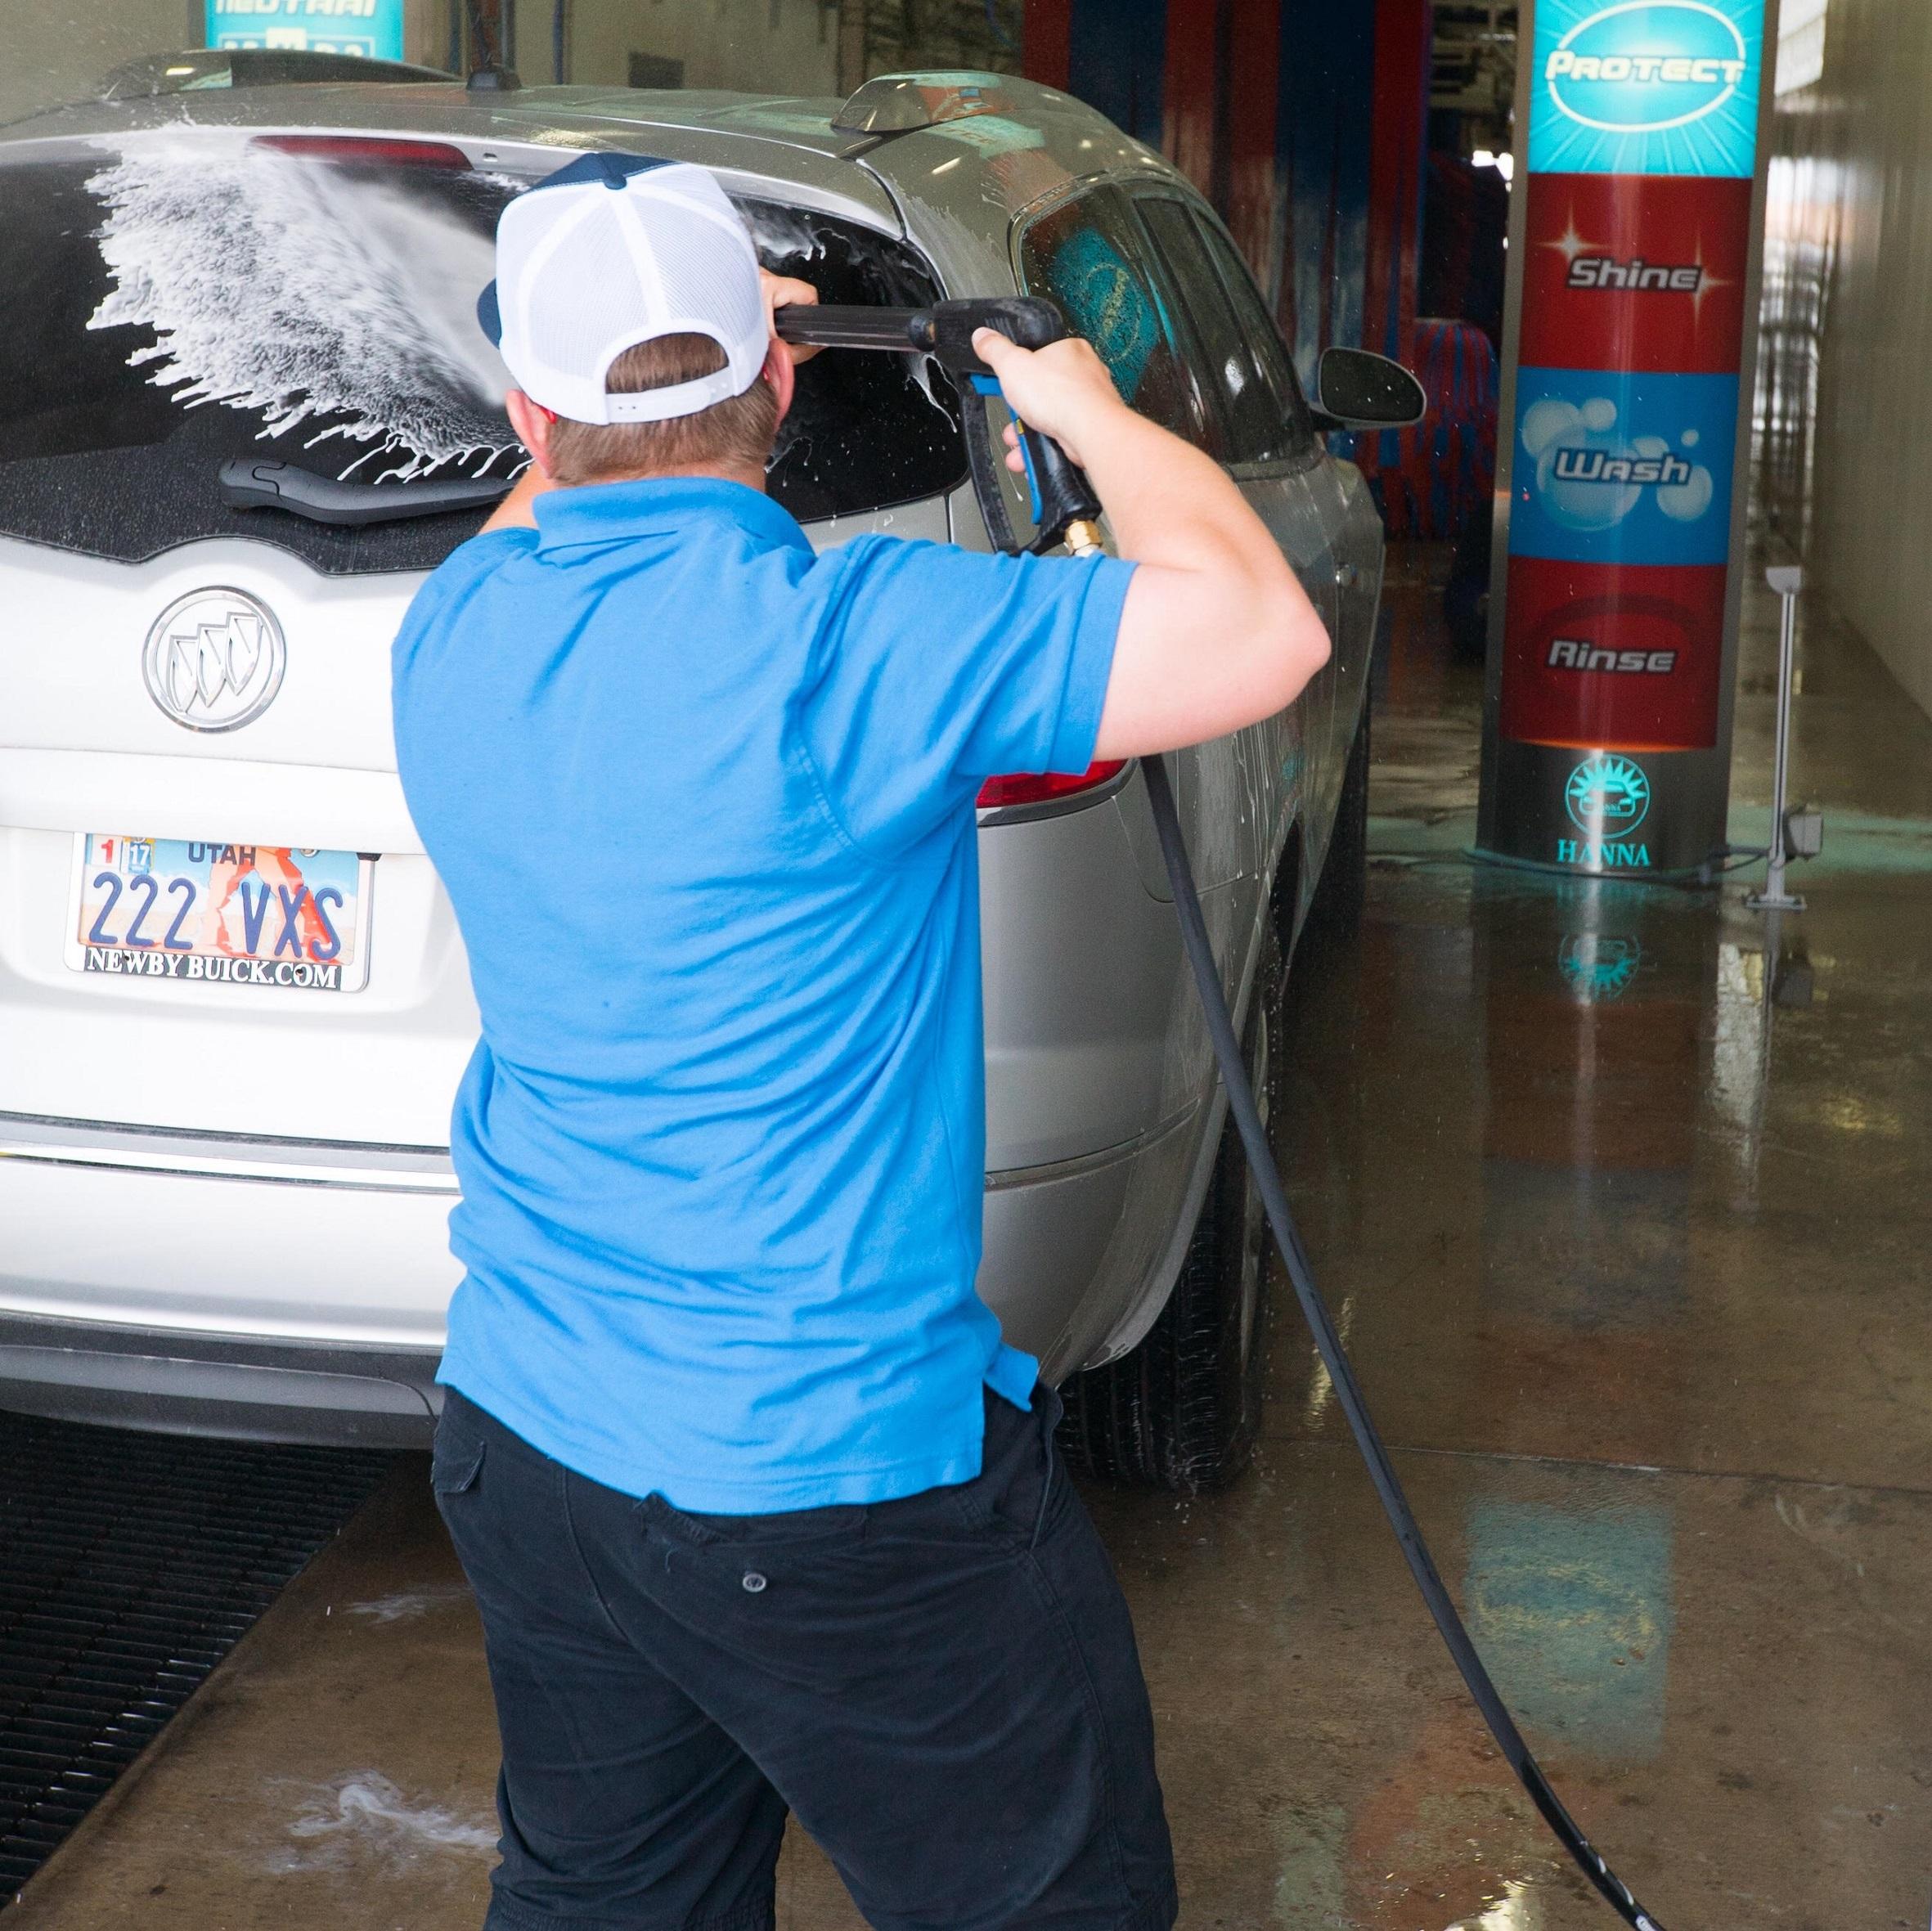 Tagg N Go Express Car Wash, St George Utah (UT